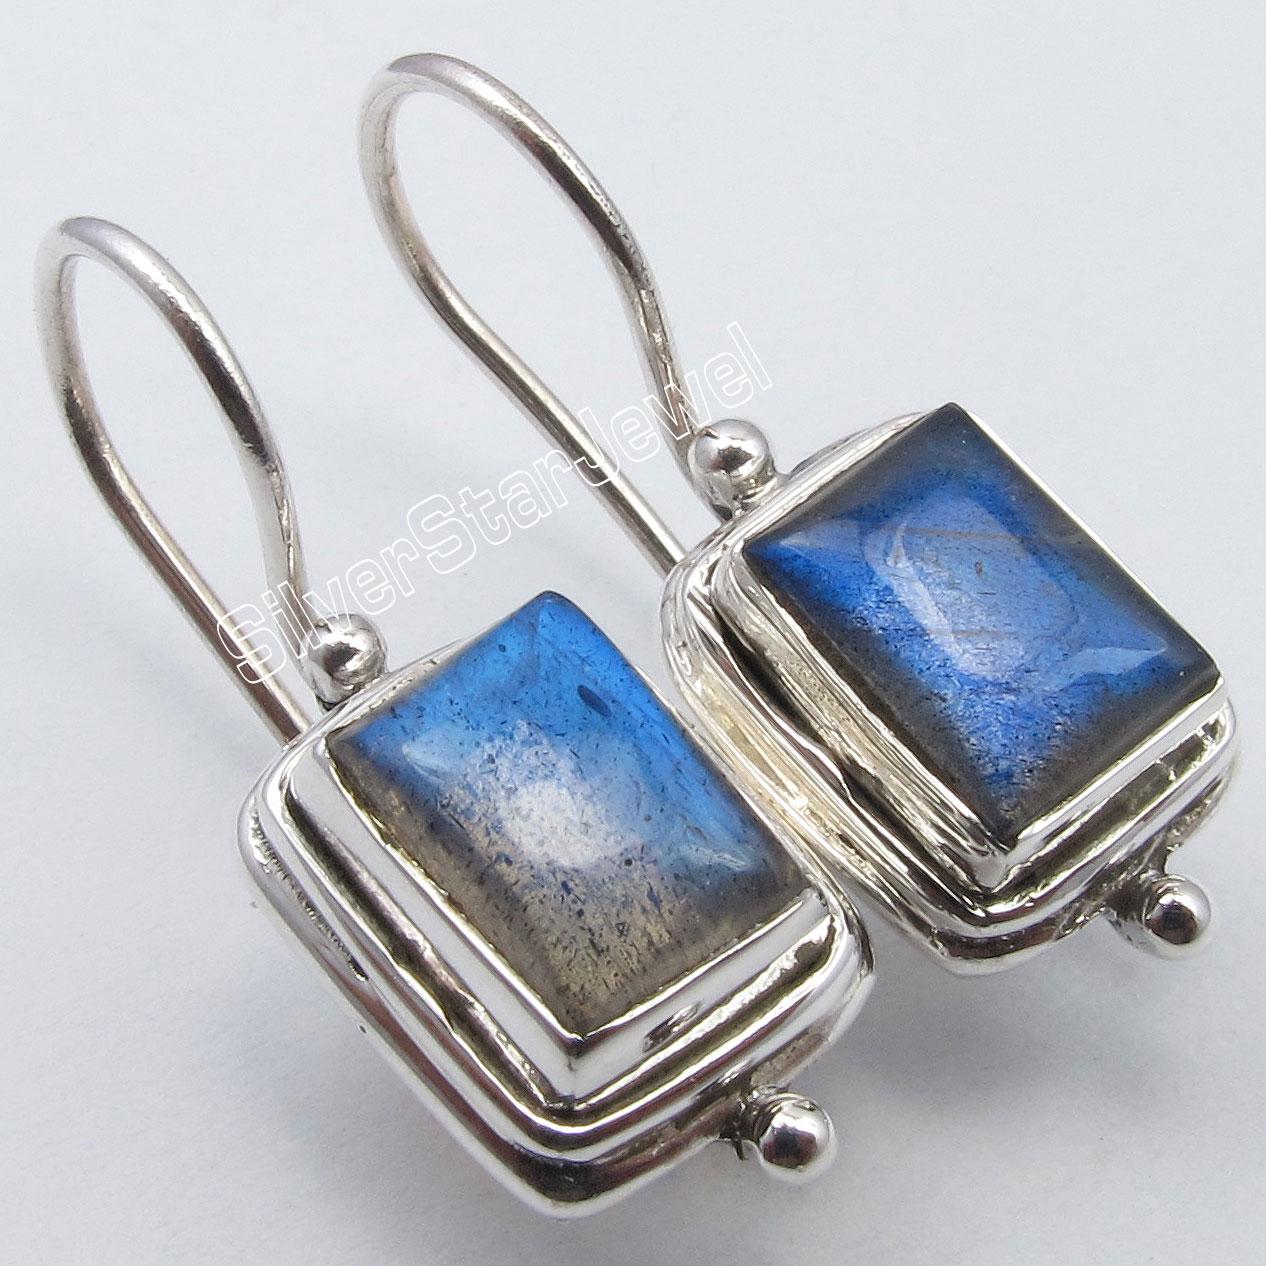 Chanti International Silver BLUE FIRE LABRADORITE Fix Wire Earrings 2.6 CM MADE IN INDIA